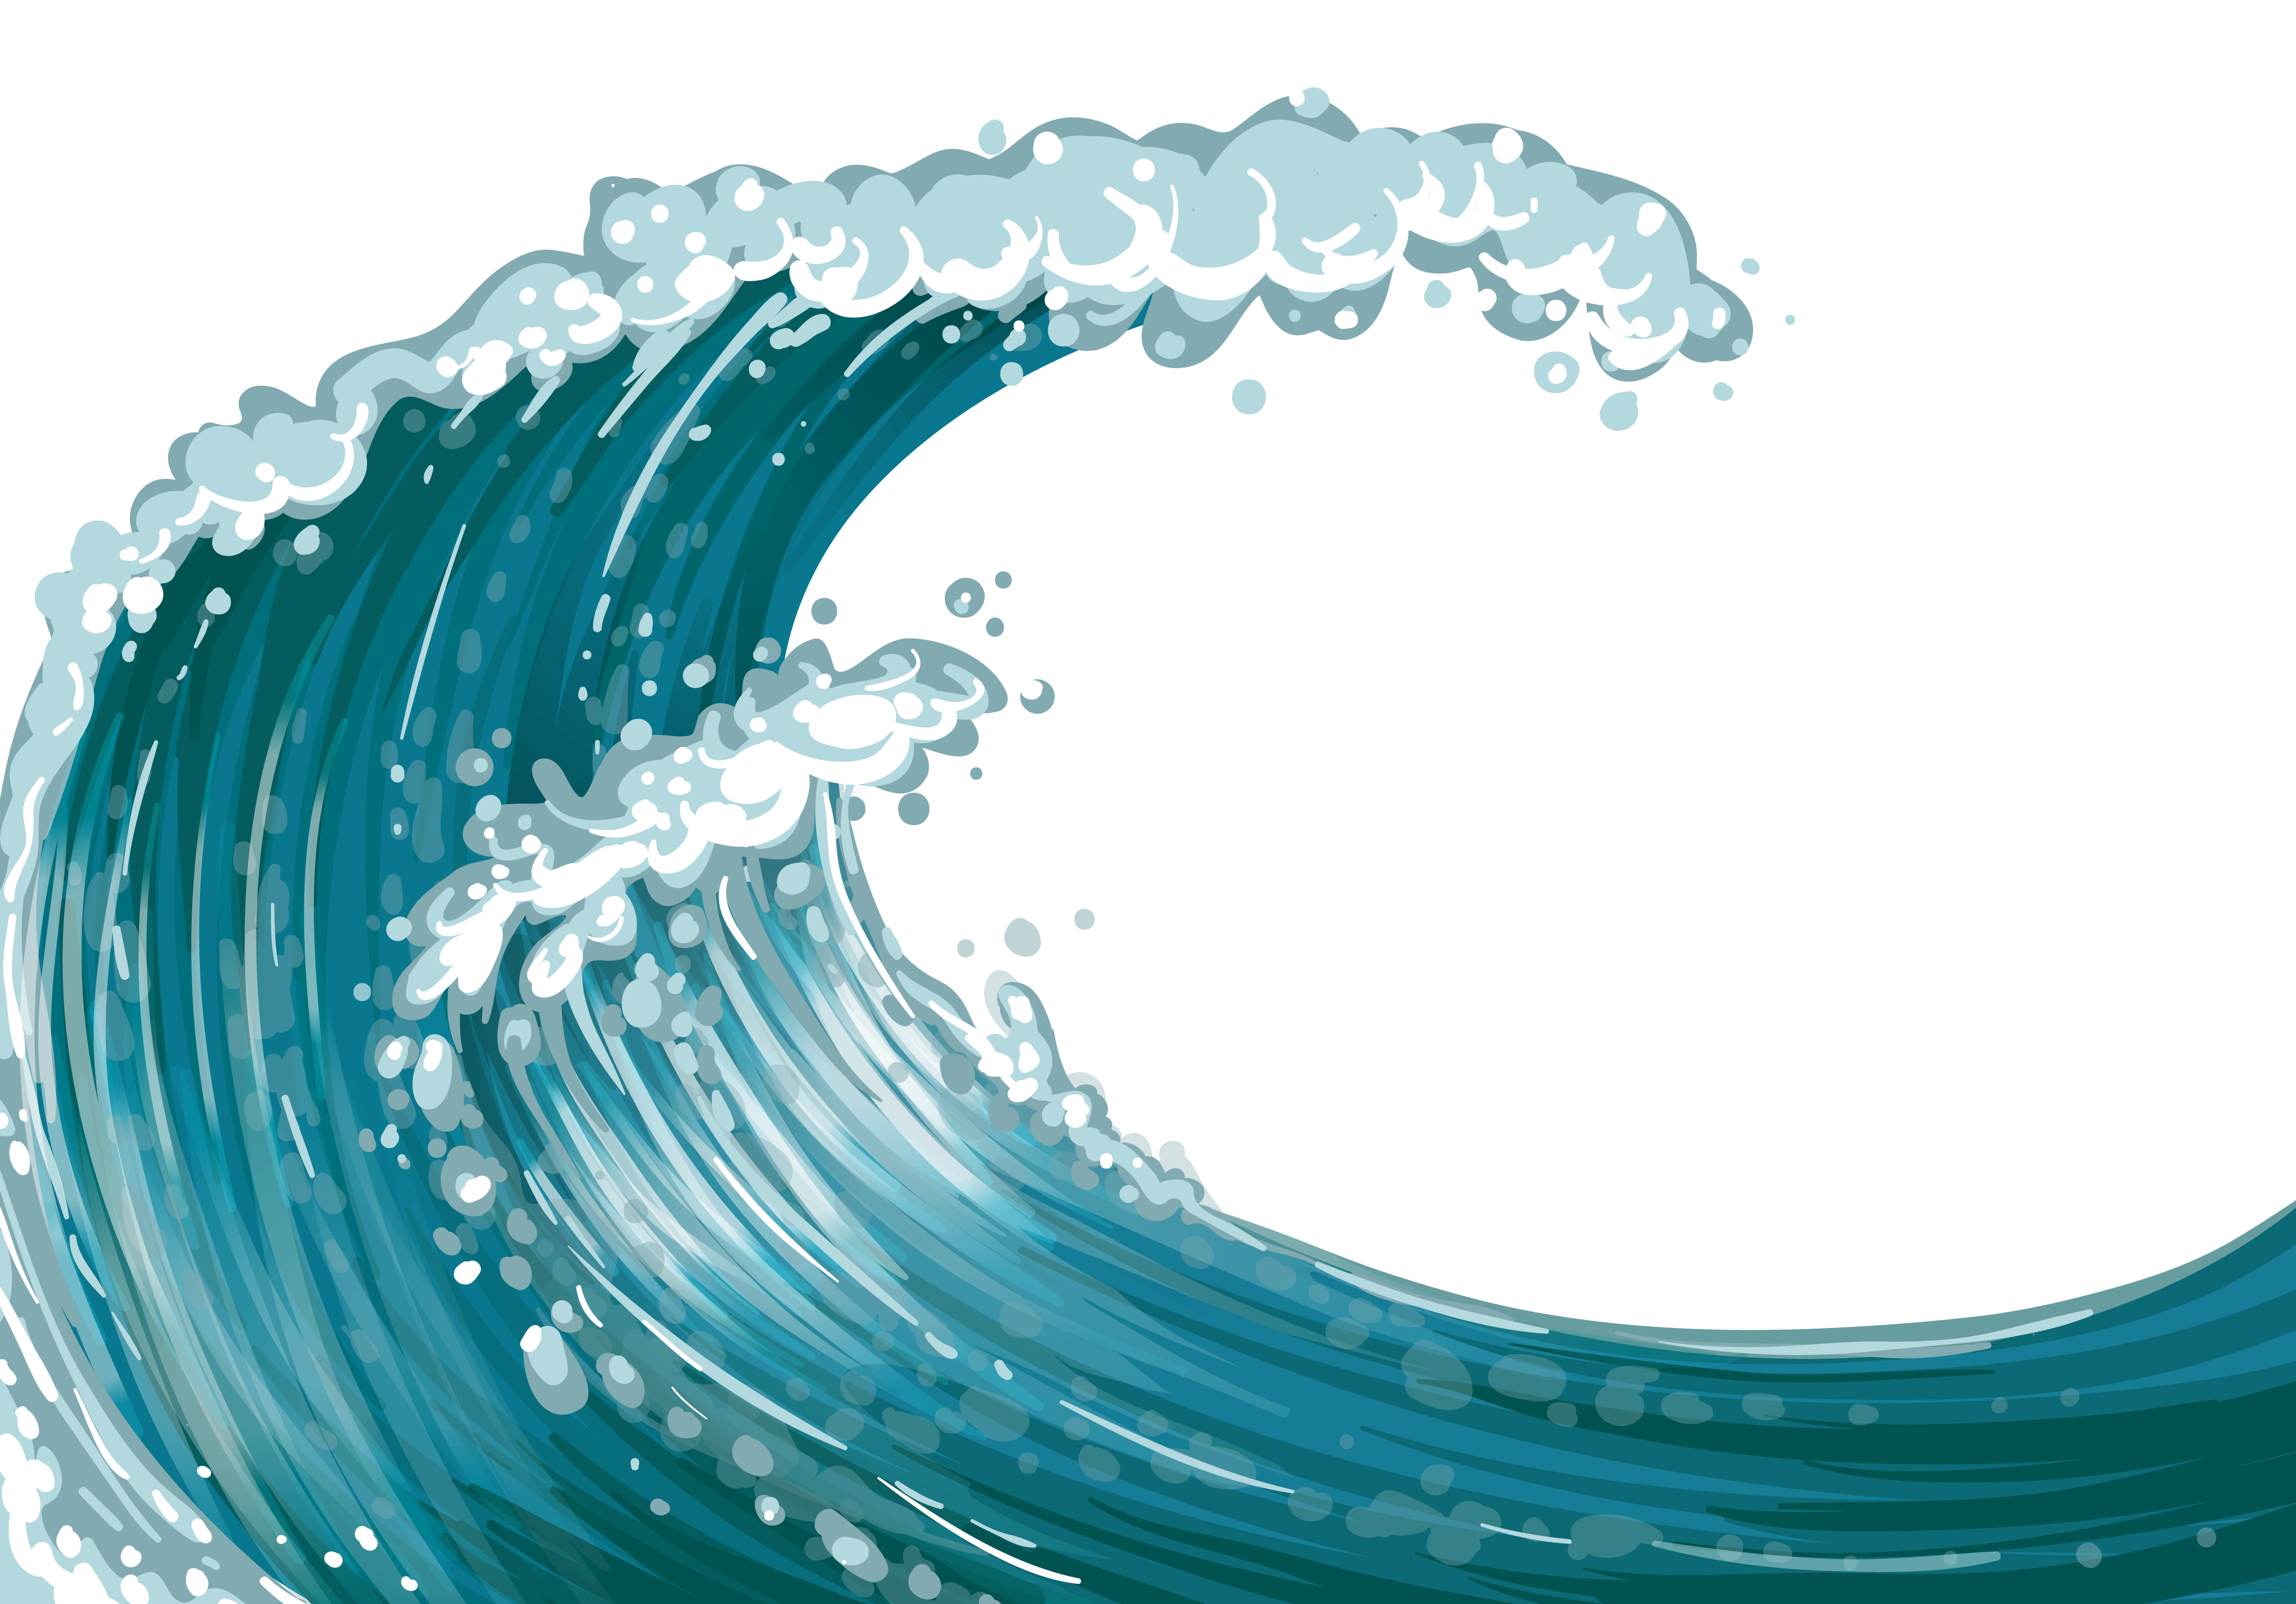 Waves Sea Wave Clipart-Waves sea wave clipart-11